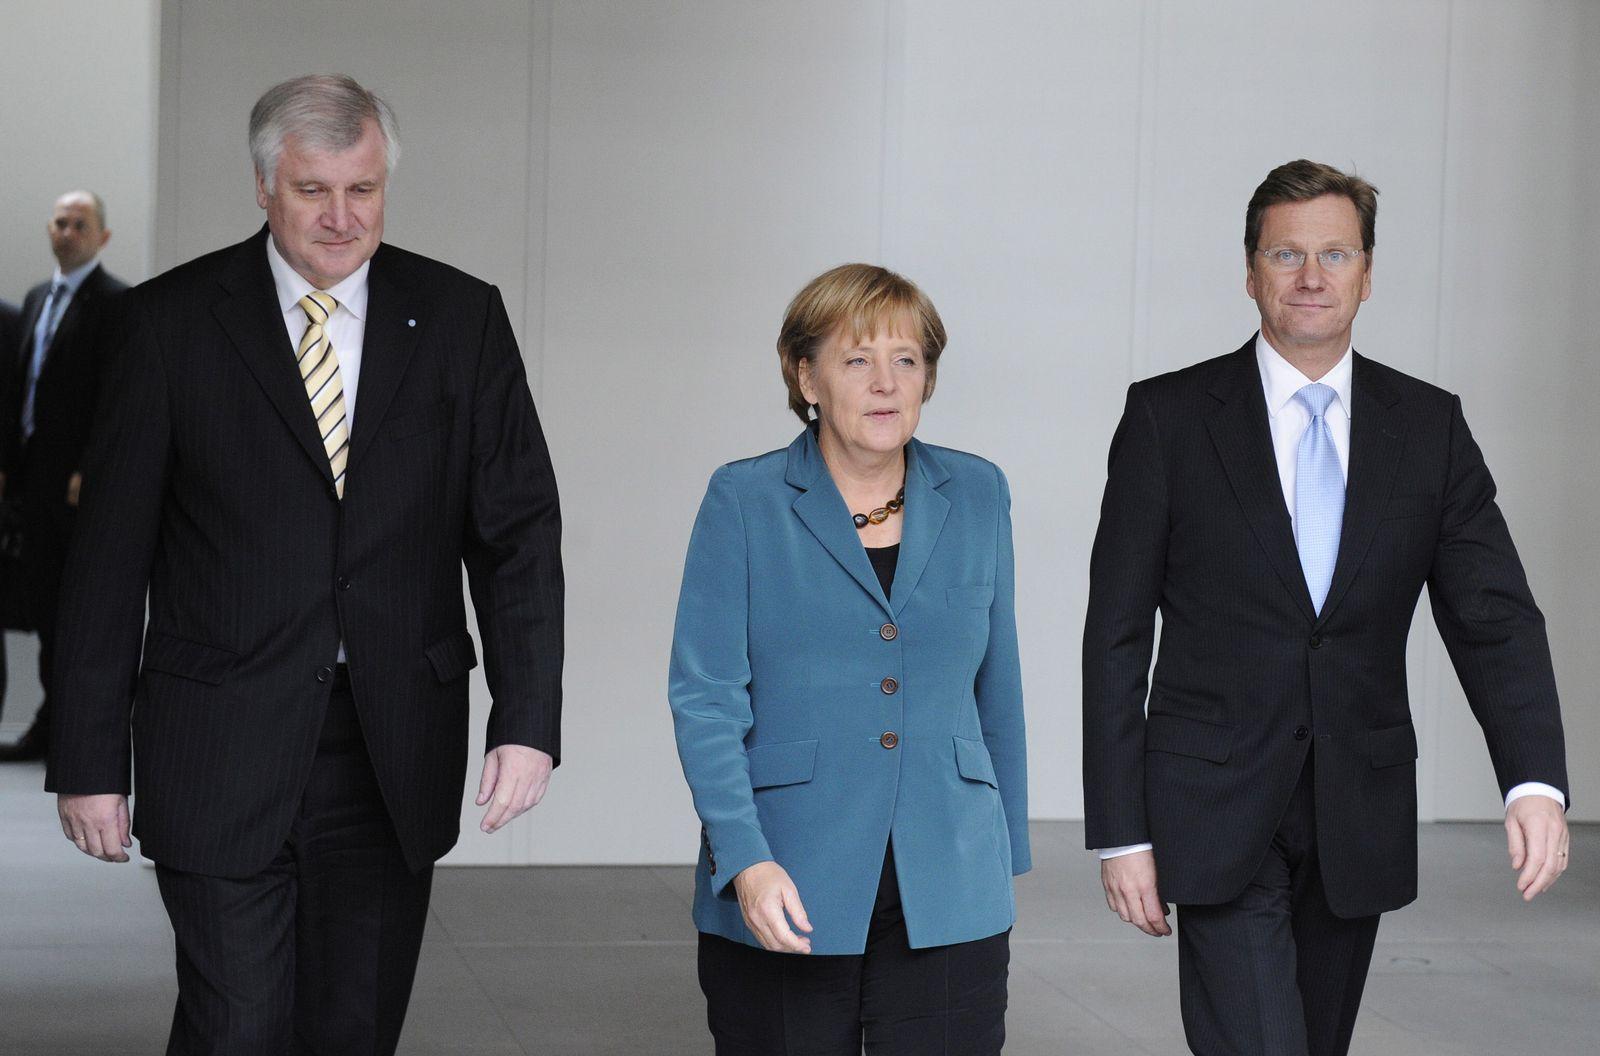 GERMANY-POLITICS-COALITION TALKS